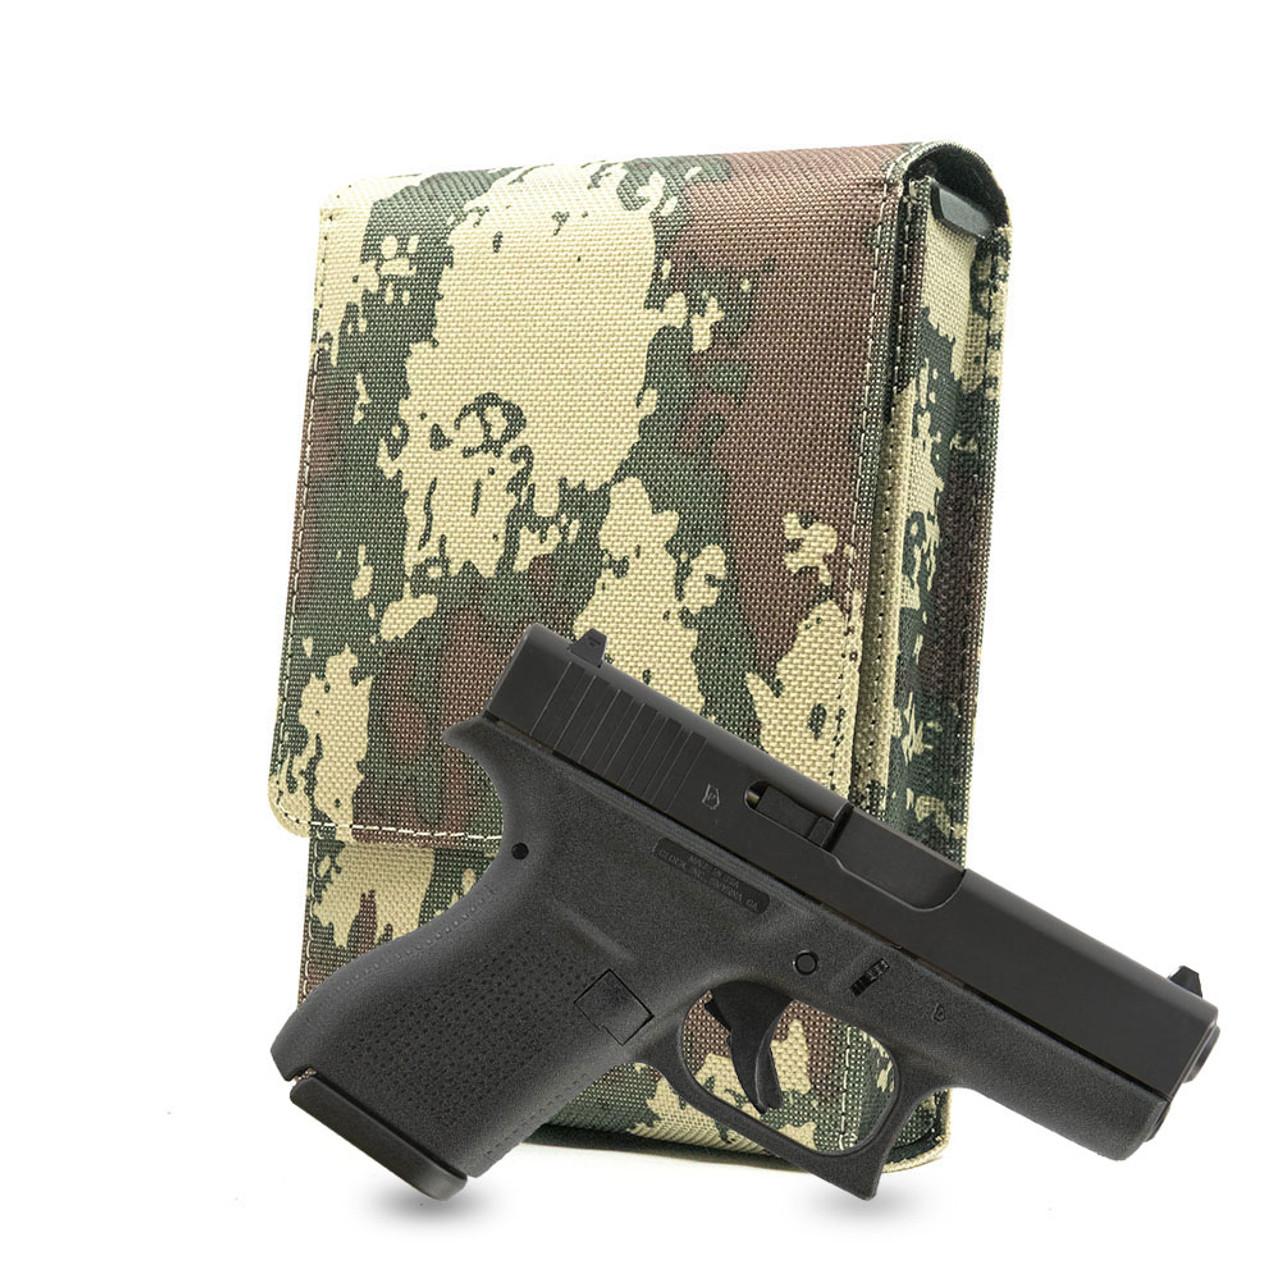 Glock 42 Camouflage Nylon Series Holster